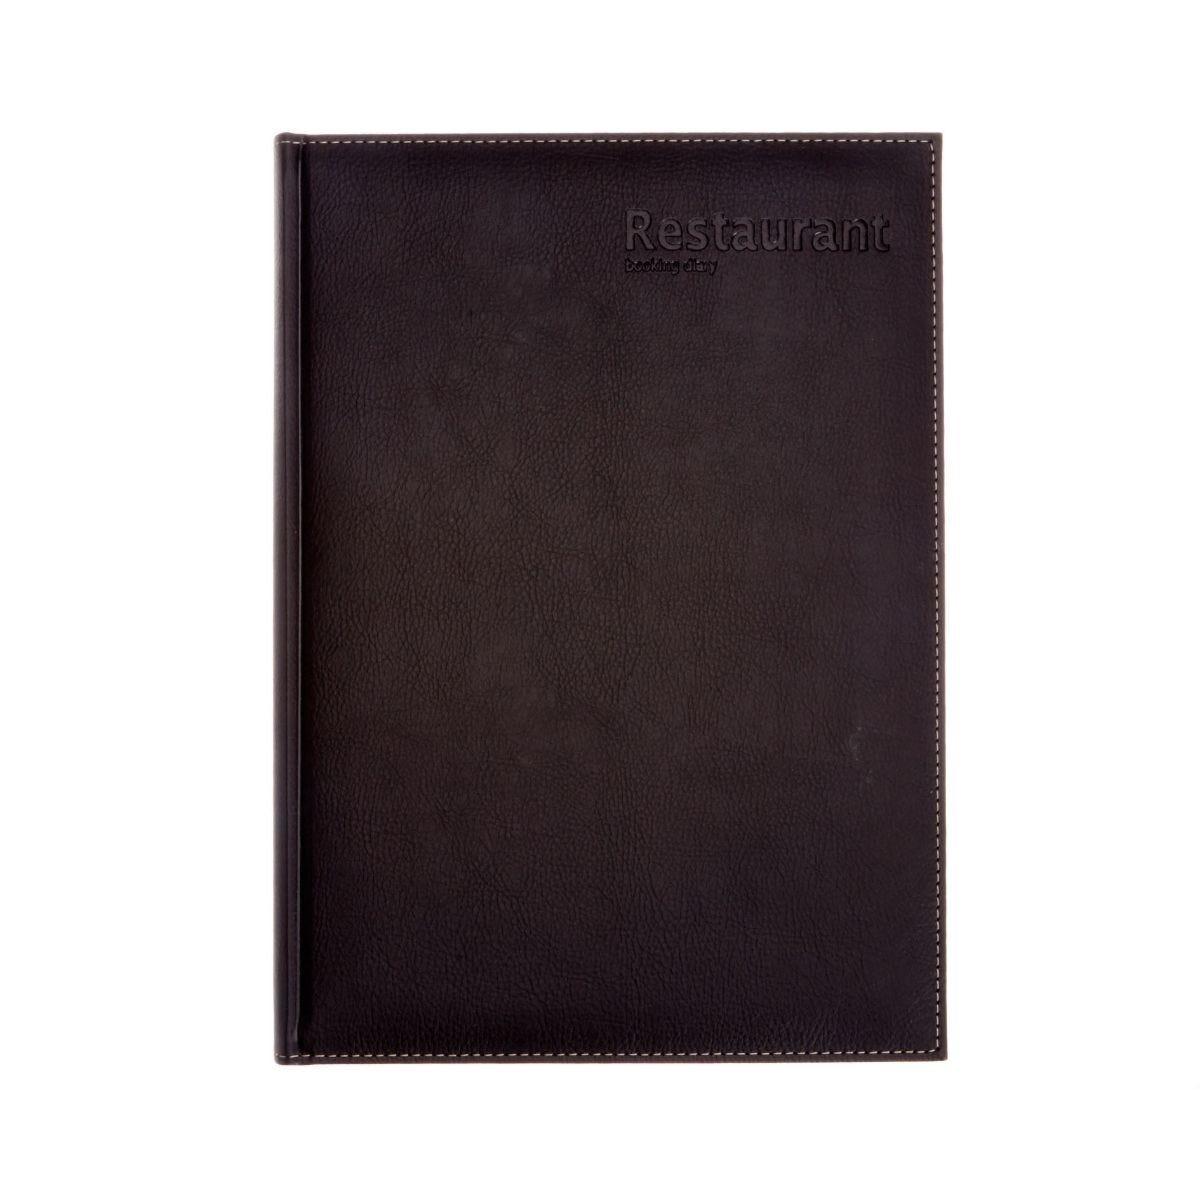 Castelli Restaurant Booking Diary Black